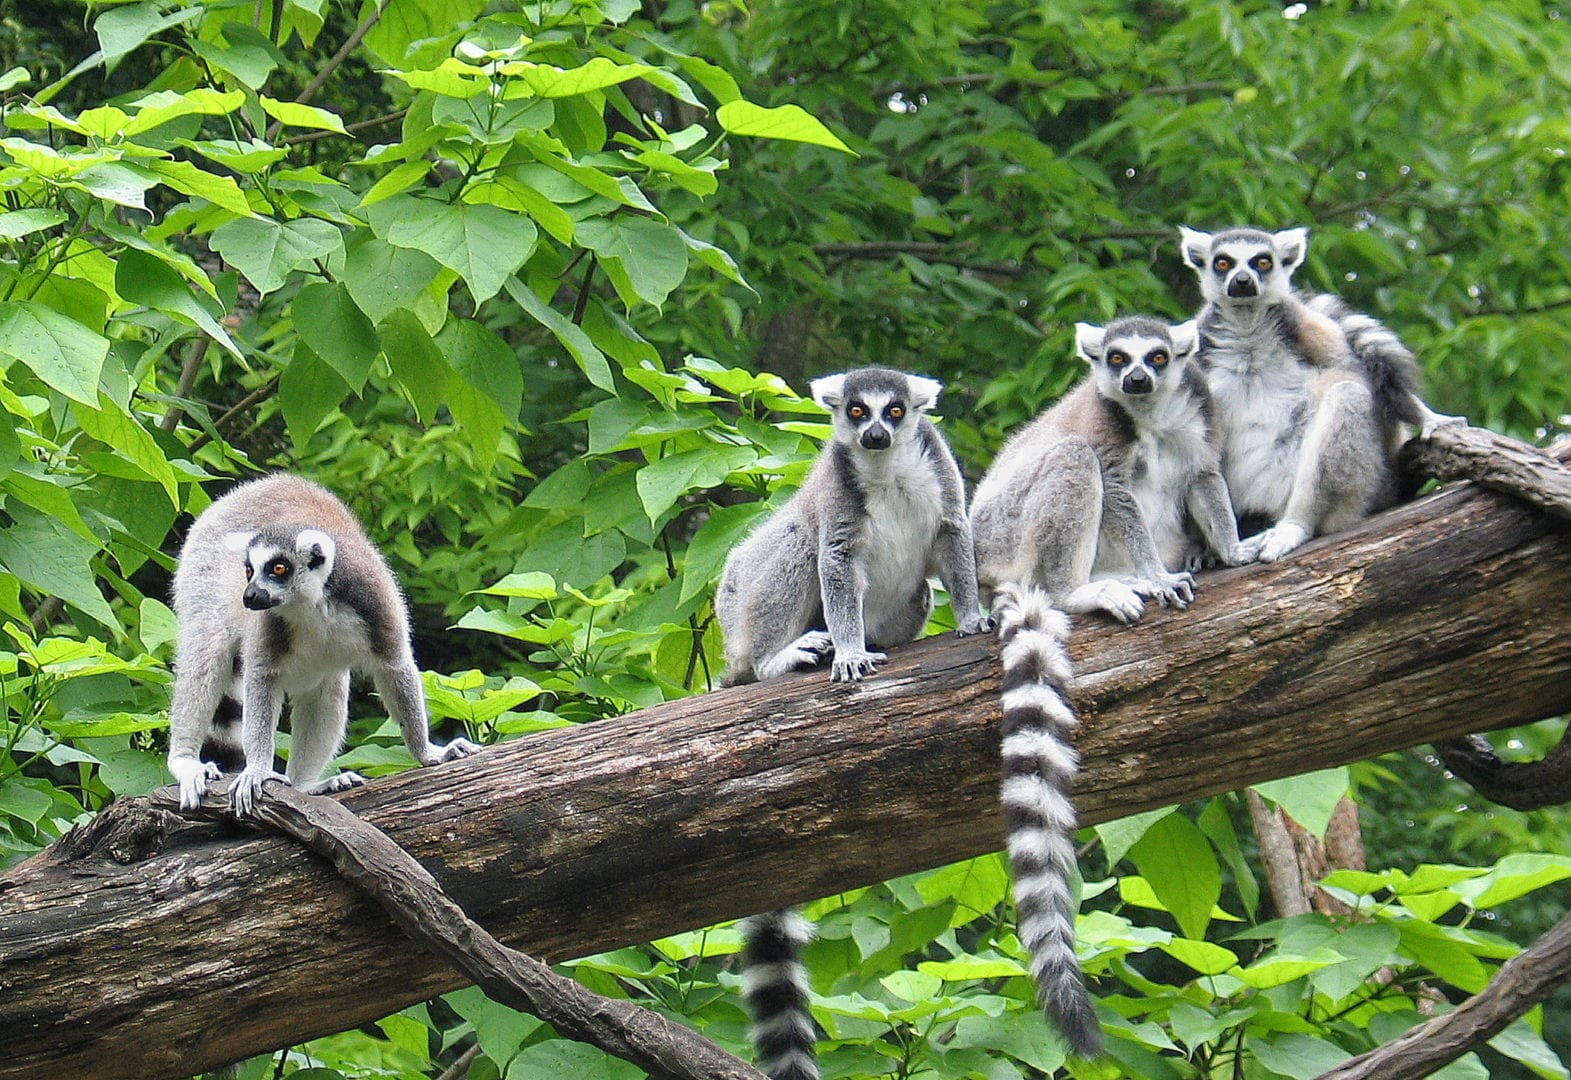 A band of lemurs